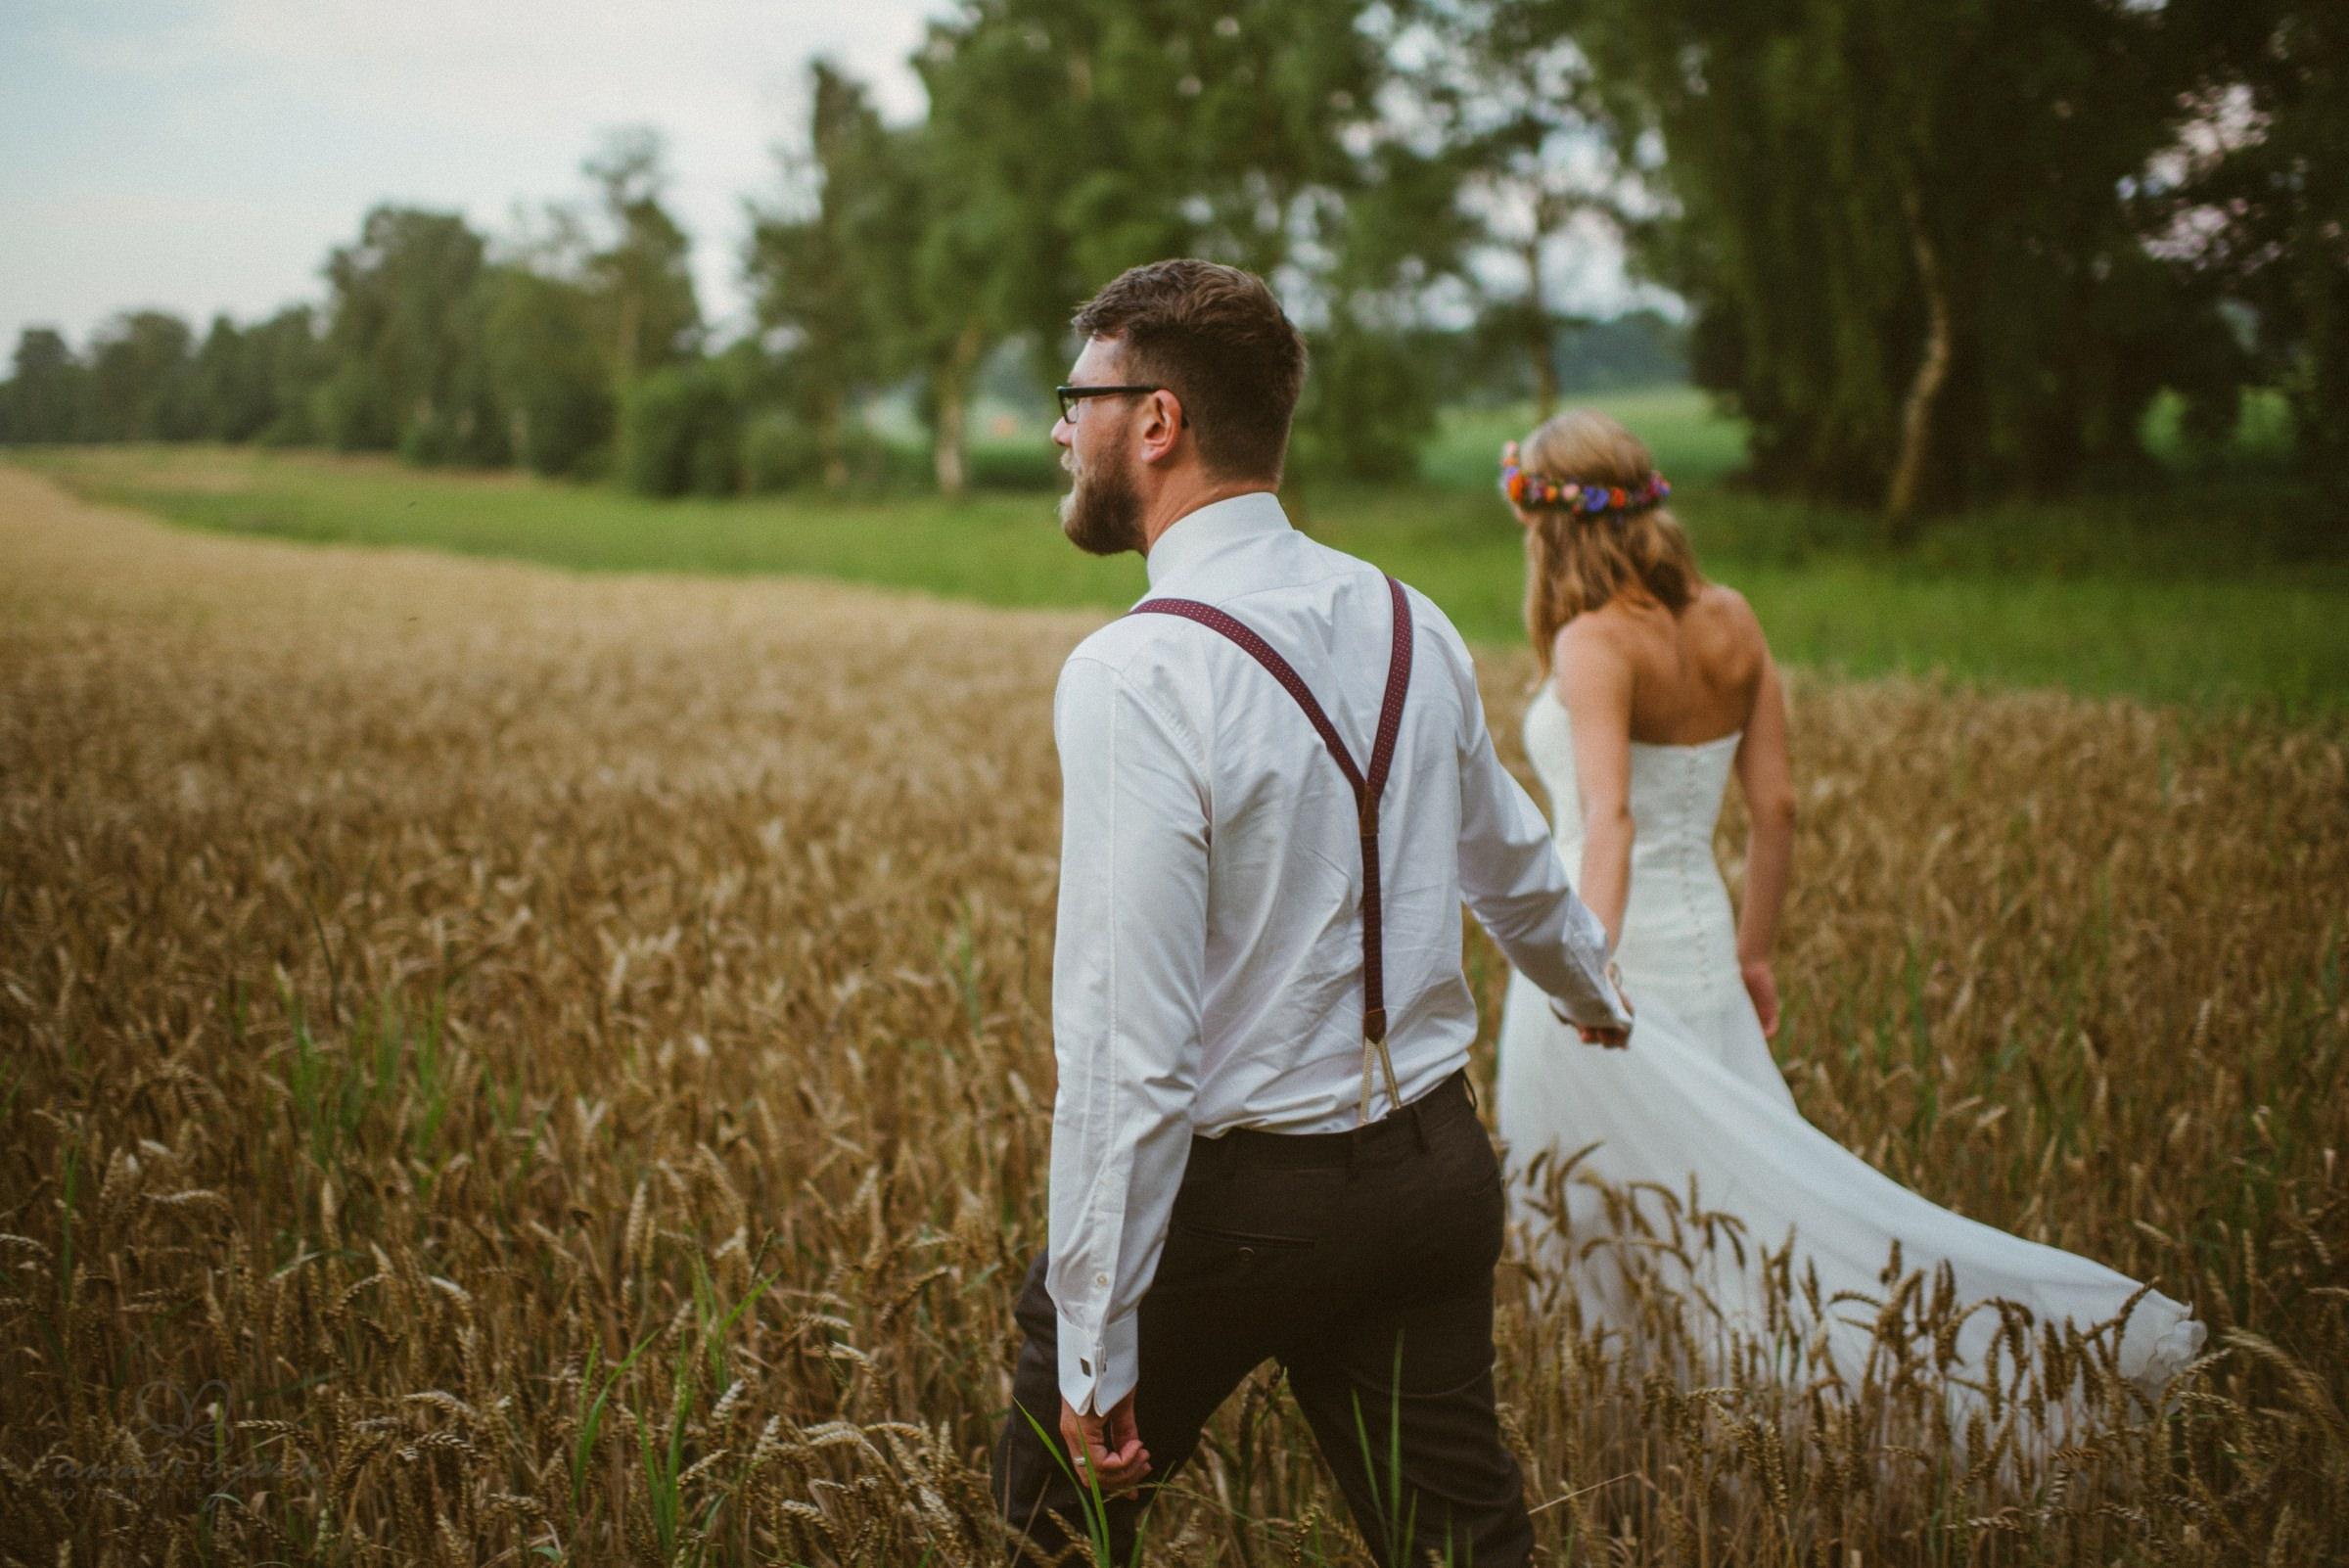 Spaziergang, Hochzeitsbild, Hosenträger, Bräutigam